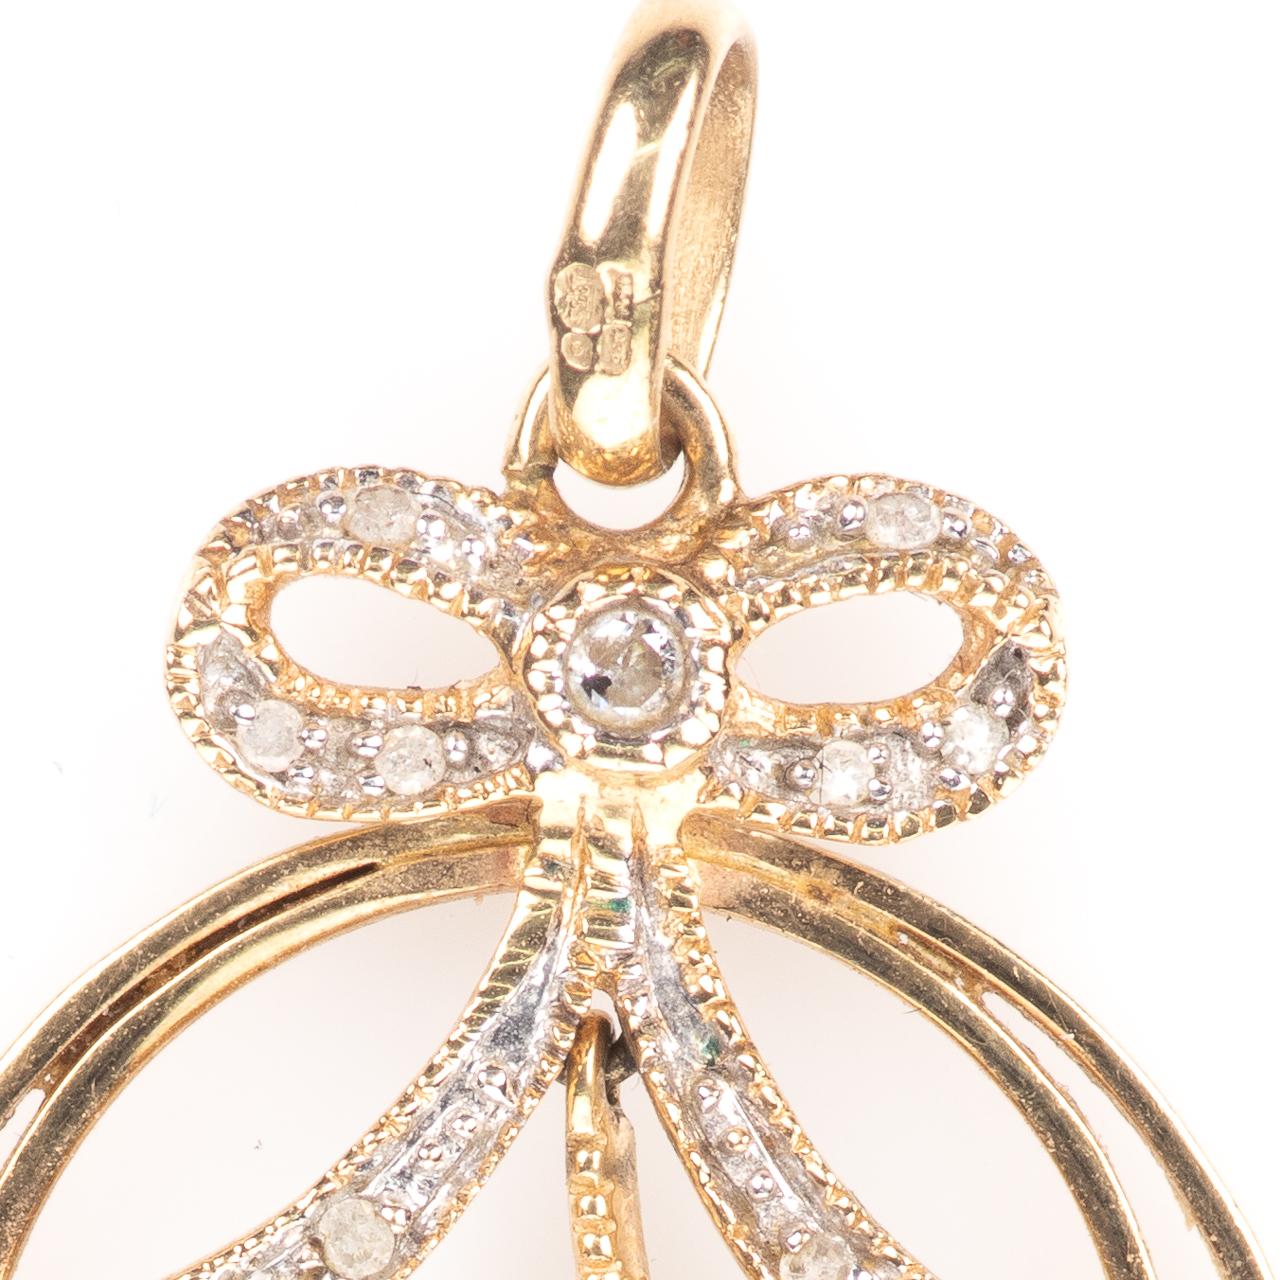 9ct Gold Art Nouveau Peridot & Diamond Pendant - Image 2 of 6